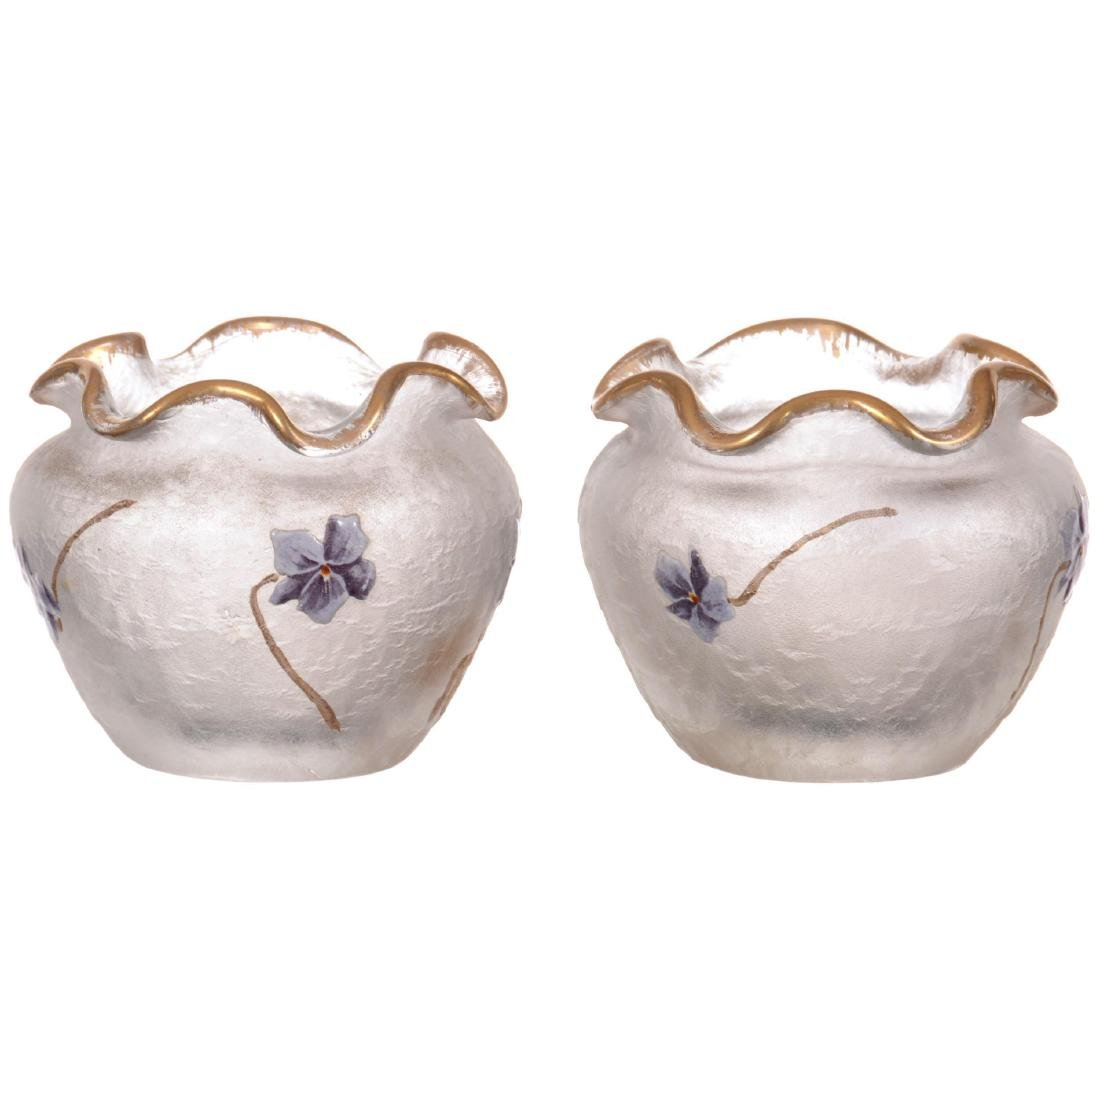 Pair Unmarked Mt. Joye Small Art Glass Vases